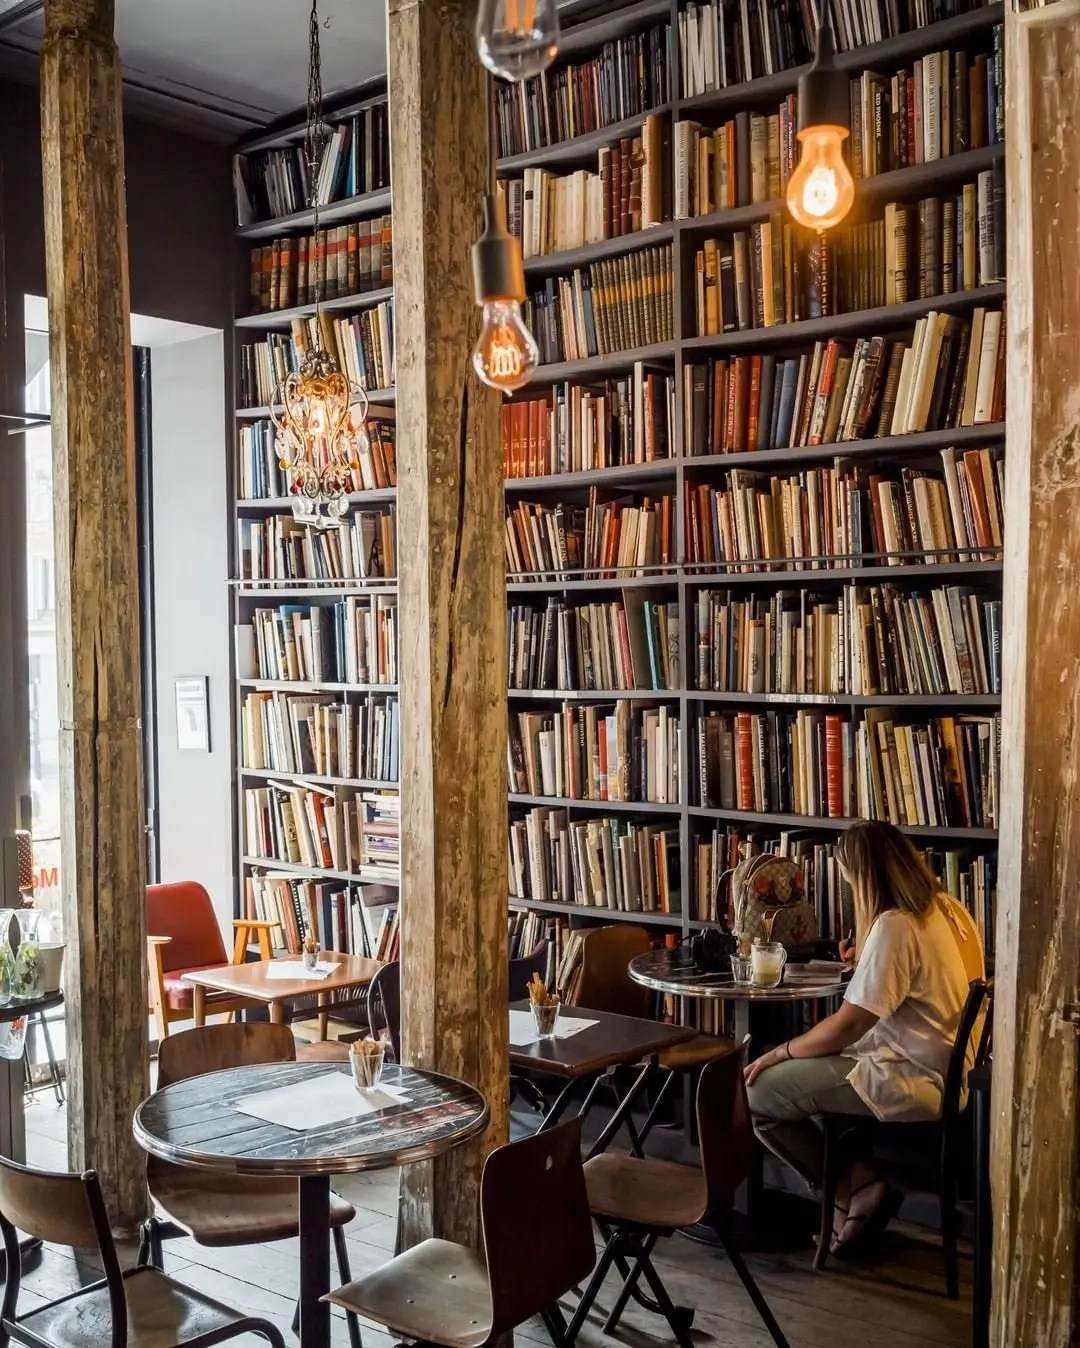 merci used book cafe